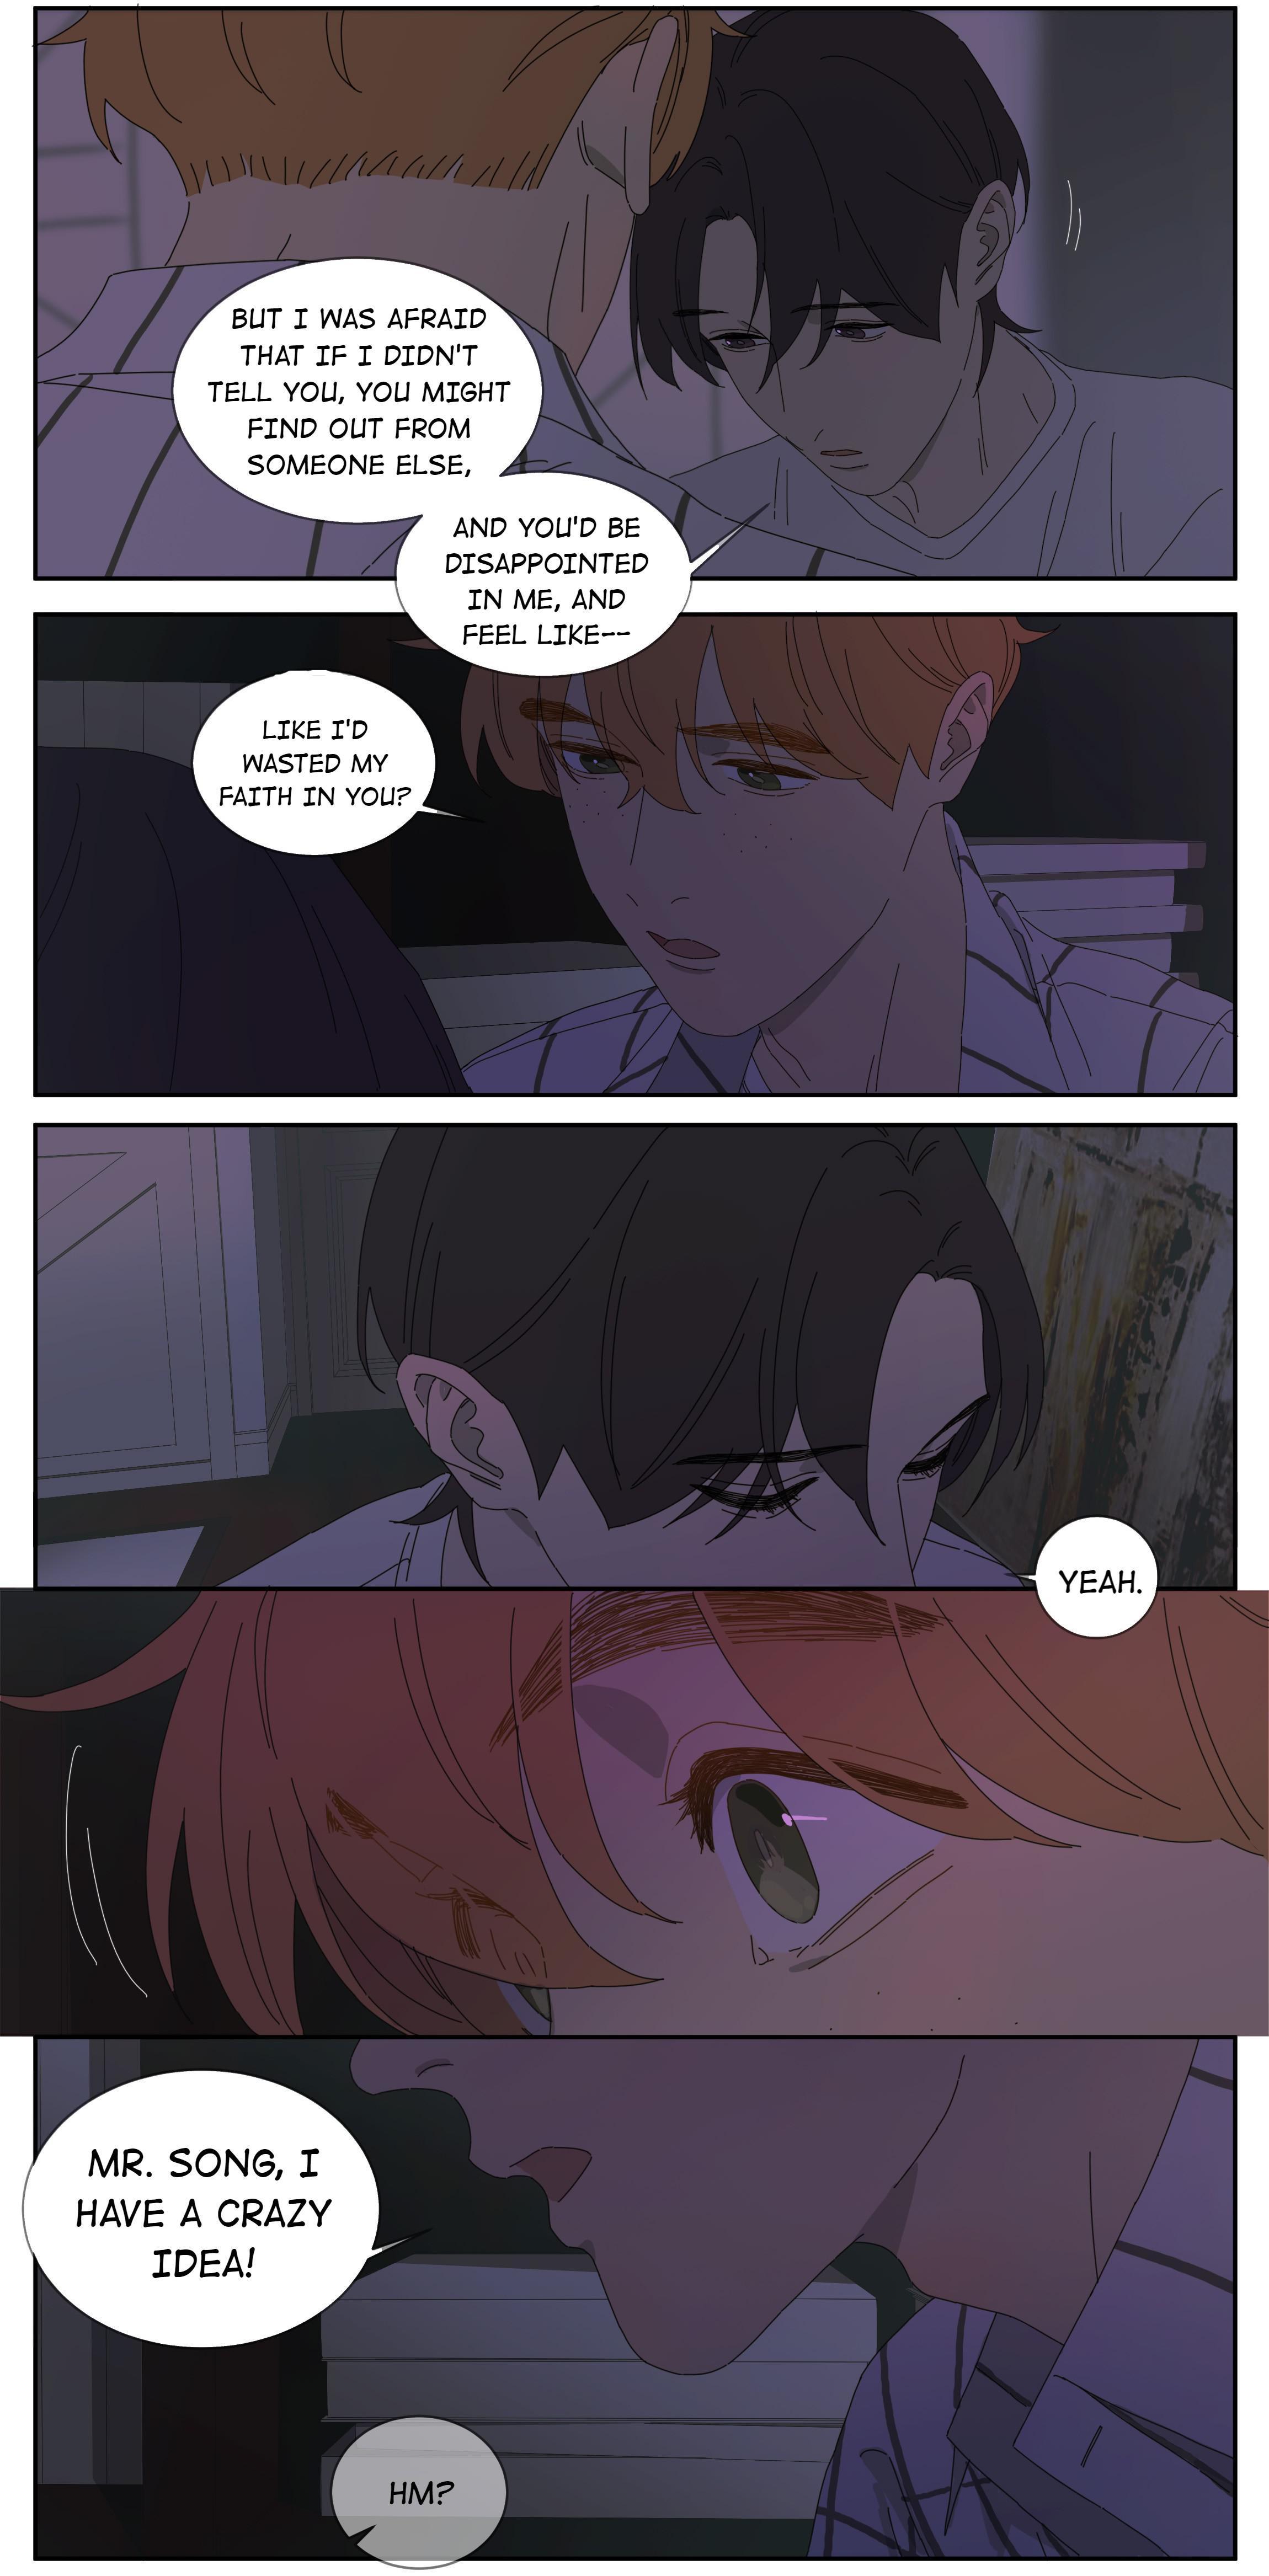 Mr. Snail Chapter 25: Do You Like Me, Maybe A Little? page 9 - Mangakakalots.com